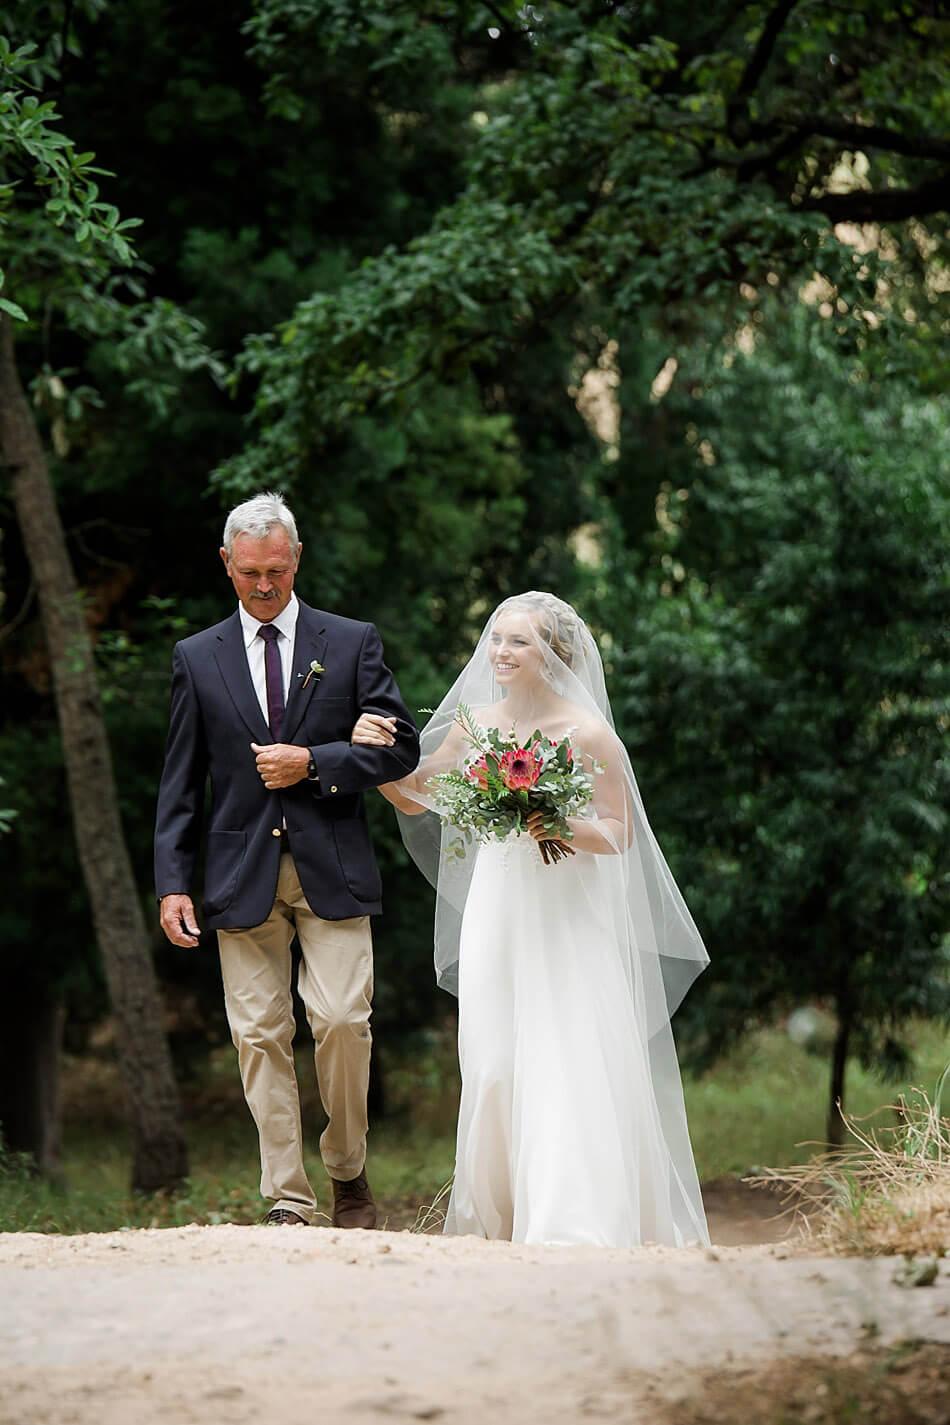 nikki-meyer-elandskloof-greyton-wedding-photographer_026